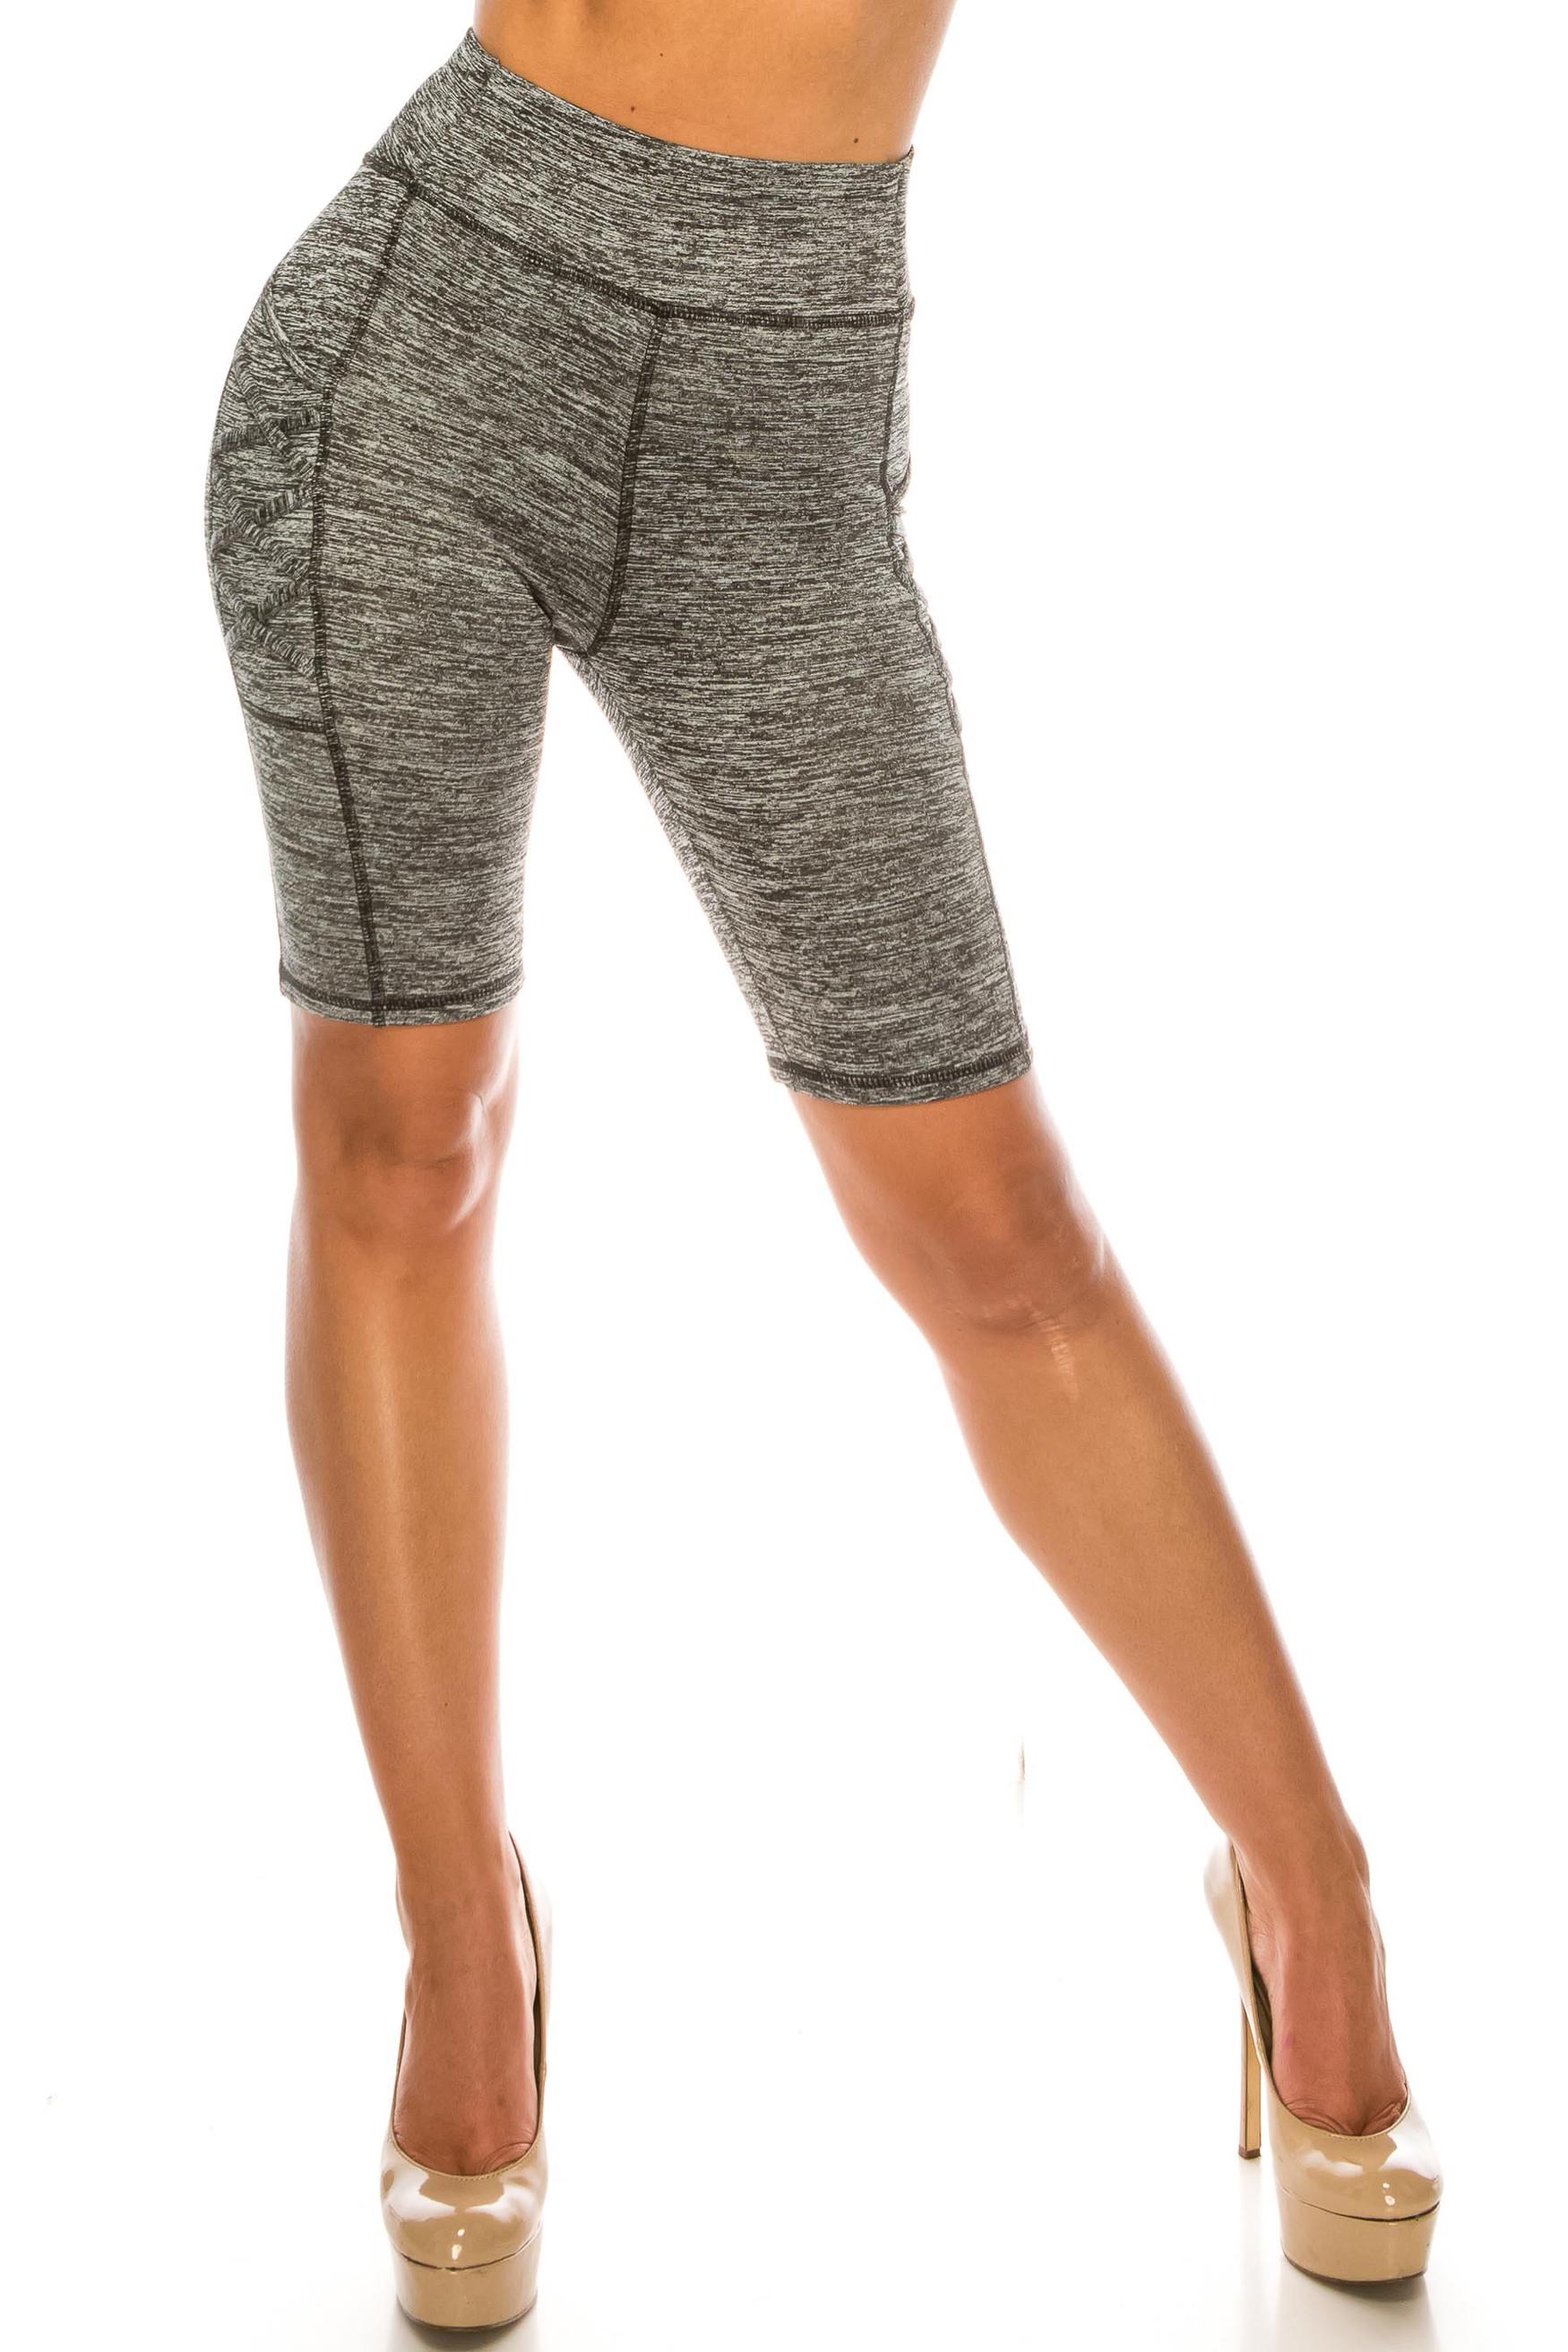 Solid Heathered Crisscross Detail High Waist Sport Biker Shorts with Side Pocket